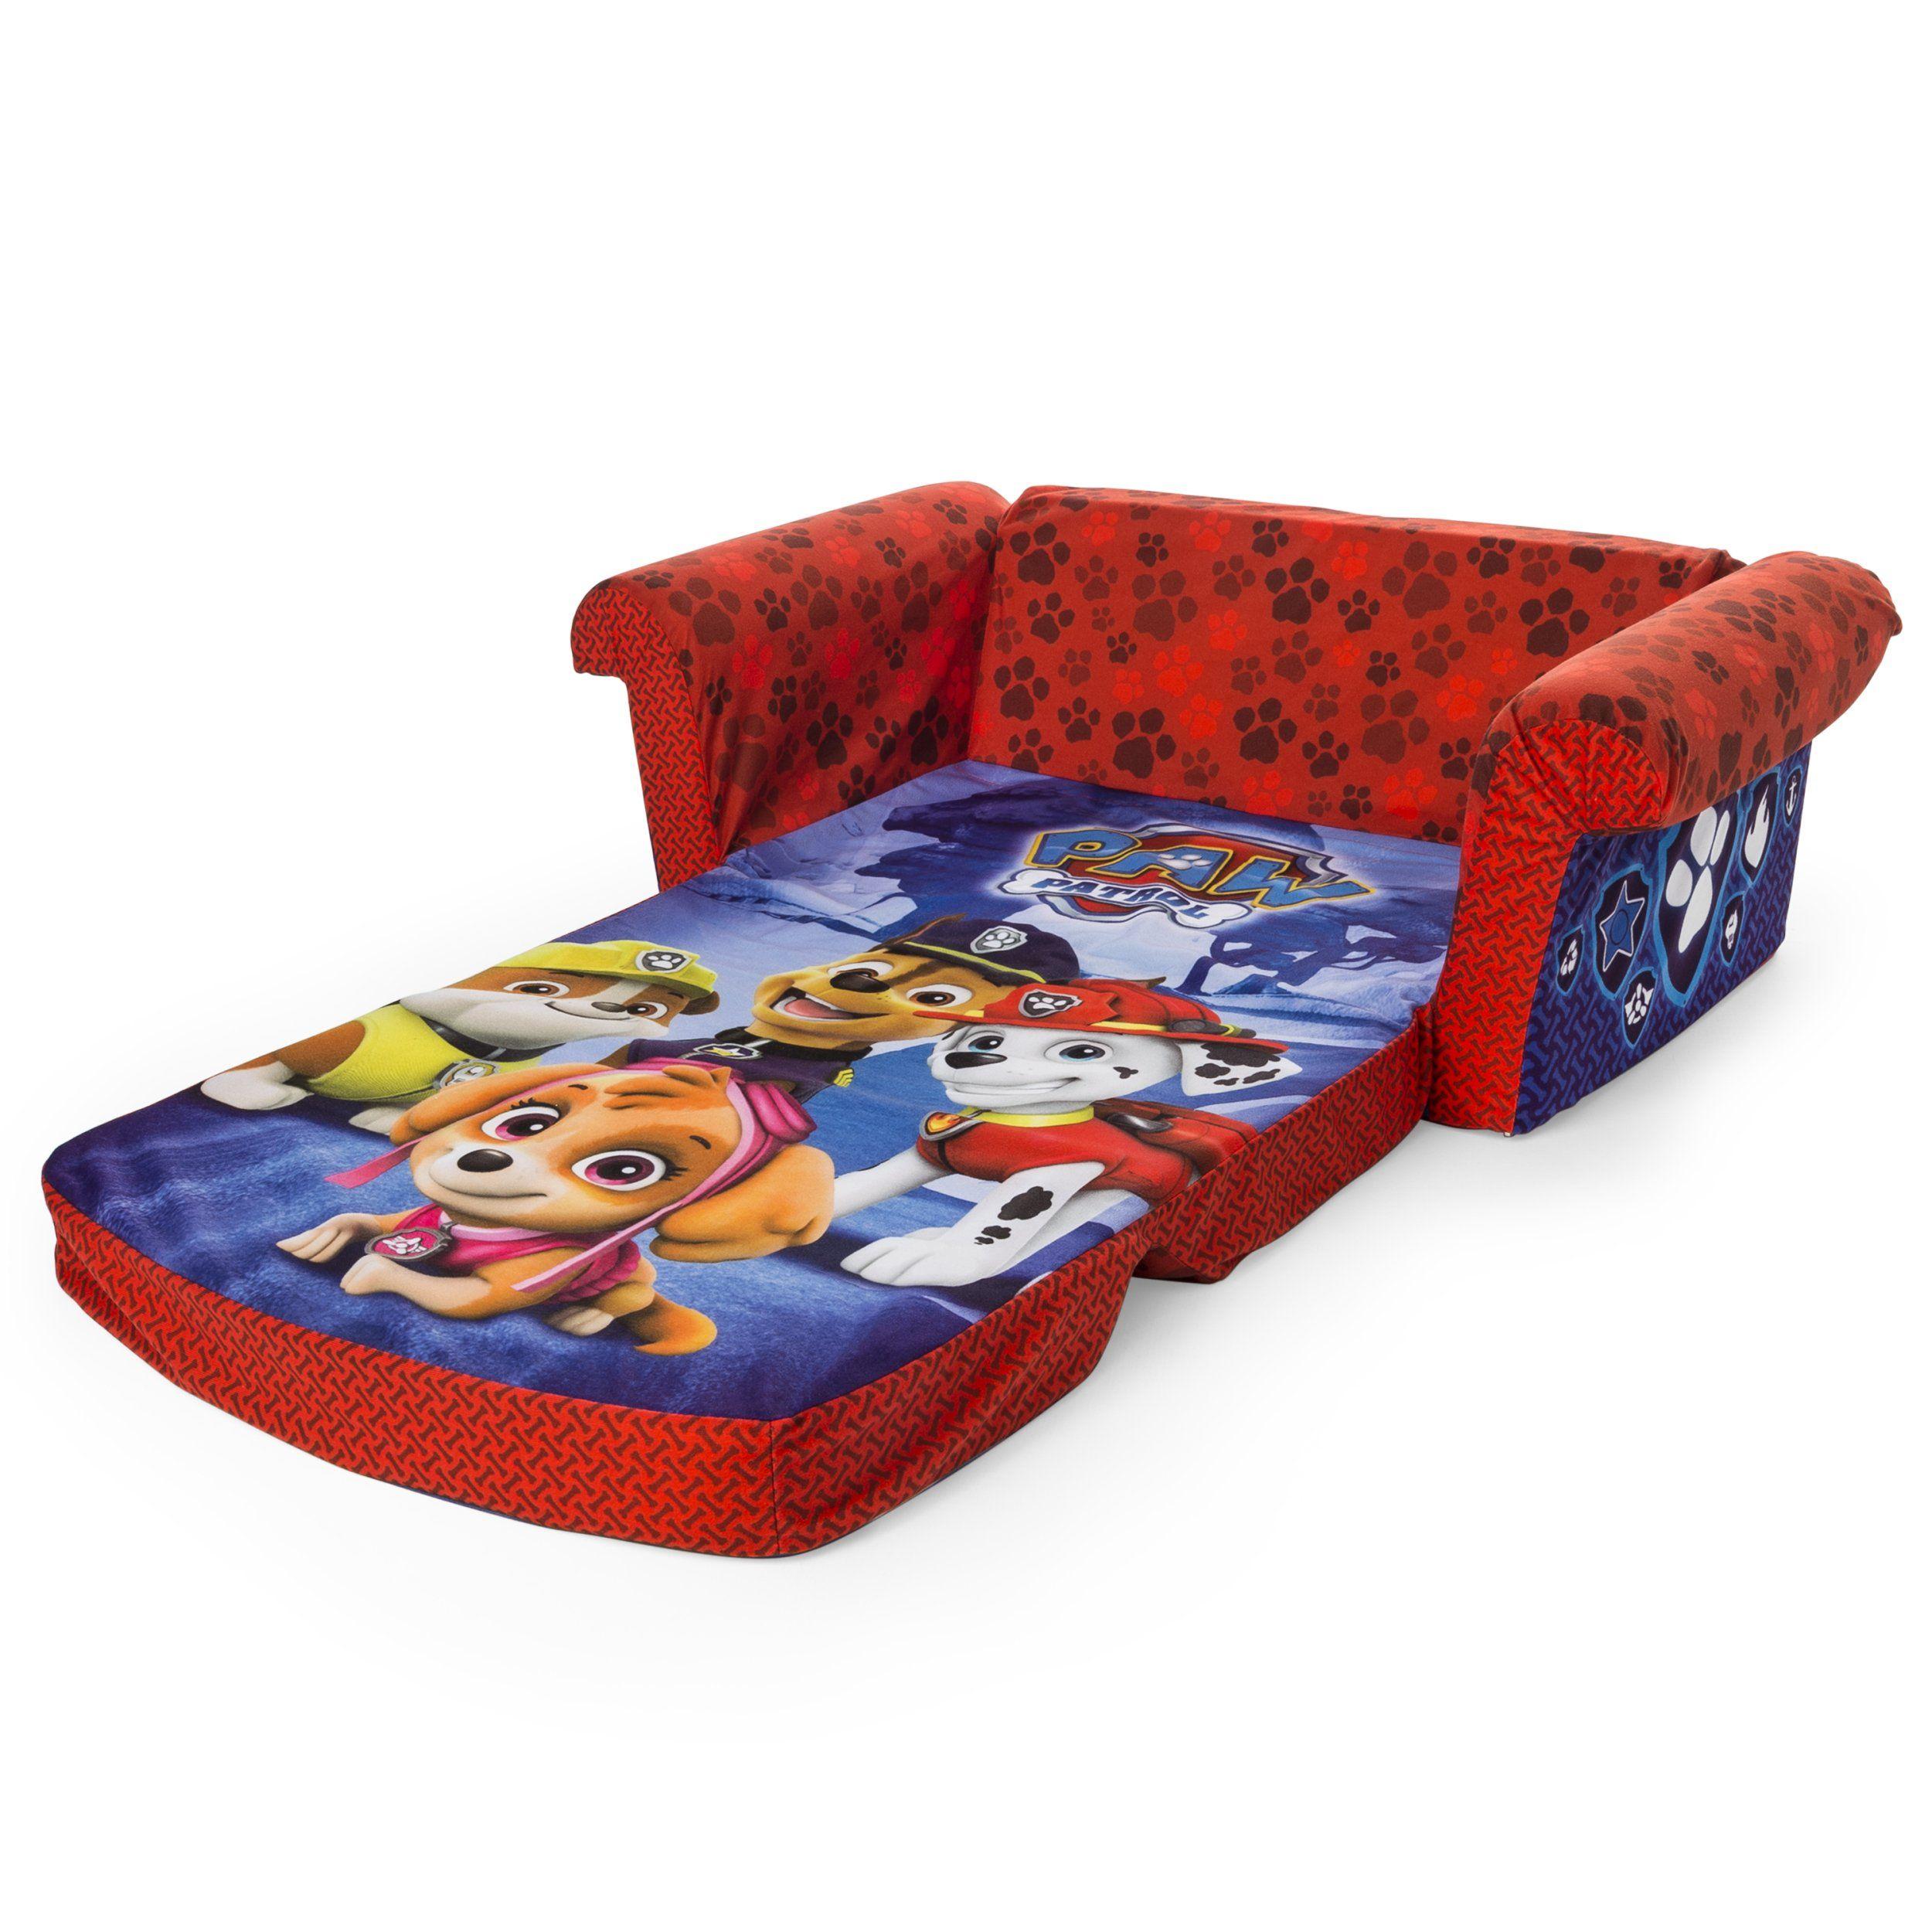 Marshmallow Furniture Childrens 2 in 1 Flip Open Foam Sofa ...